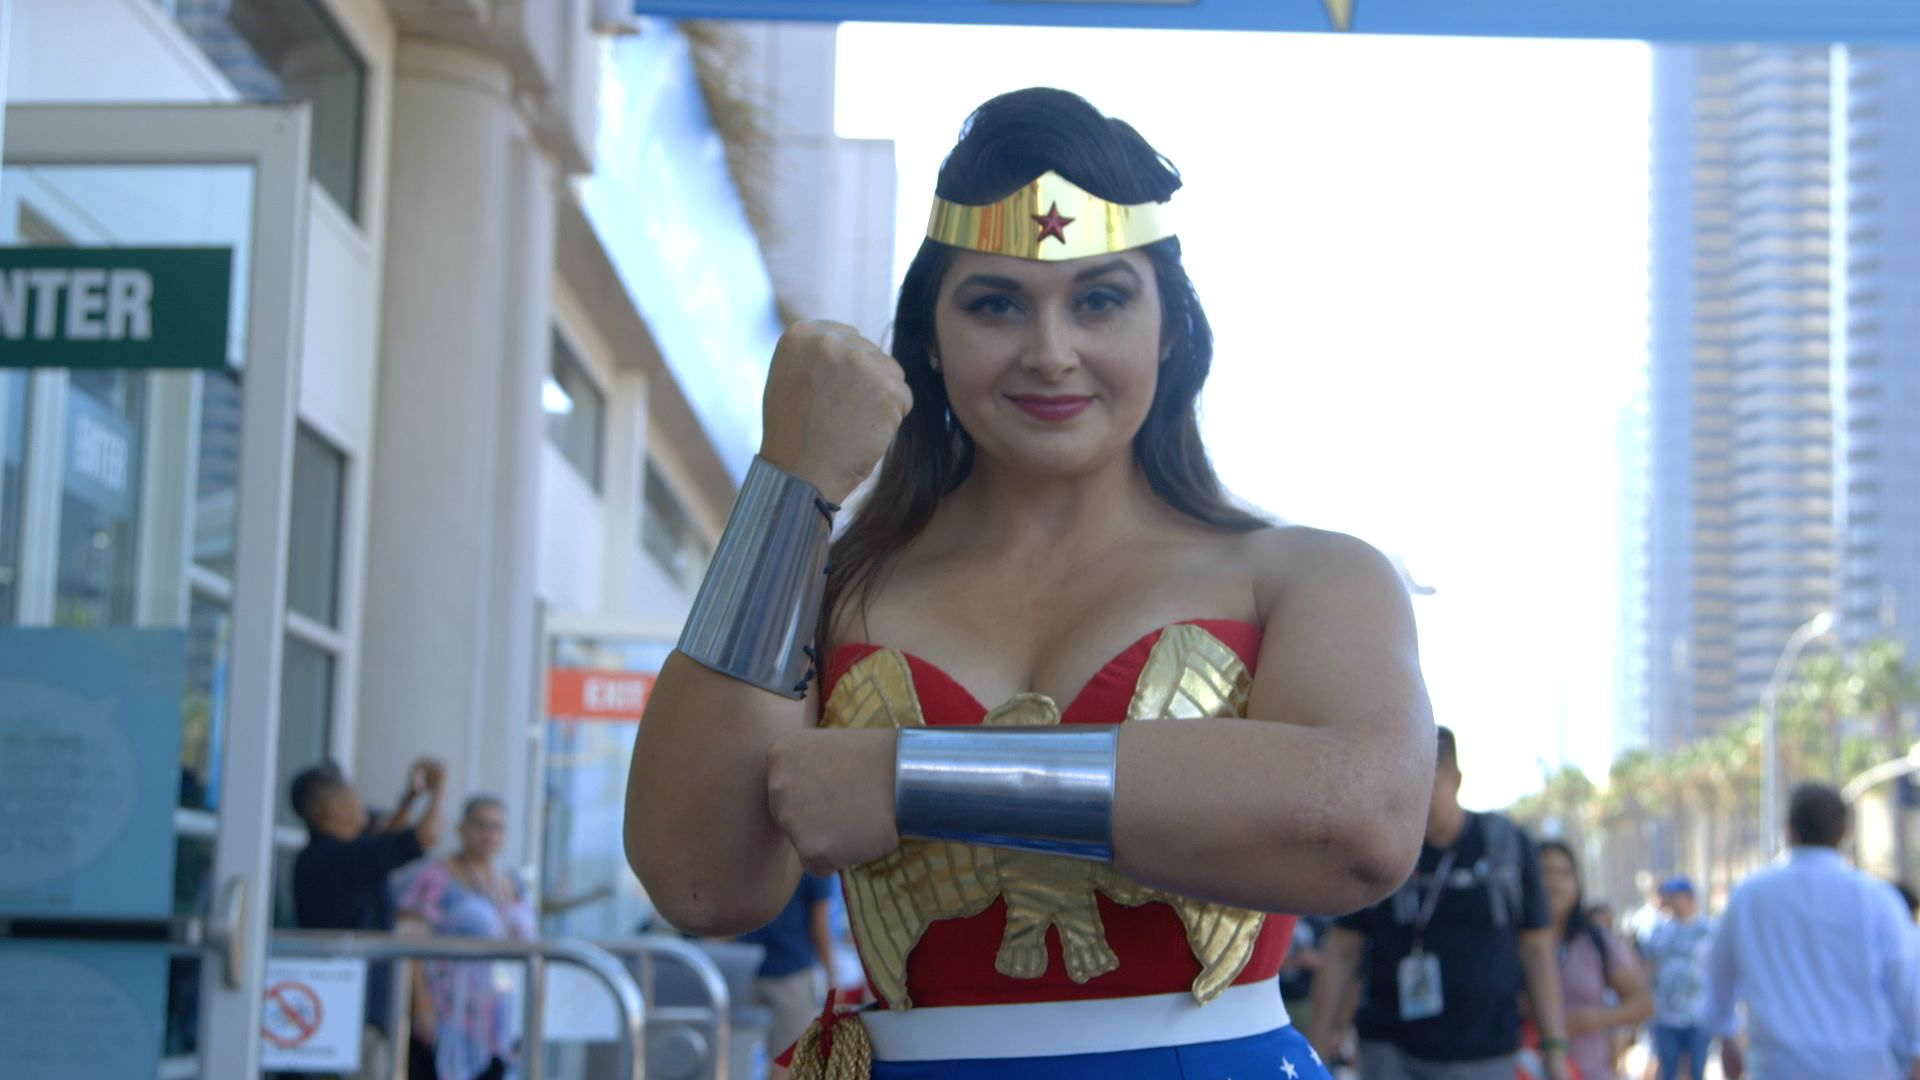 The 7 Best Wonder Women at Comic-Con 2017